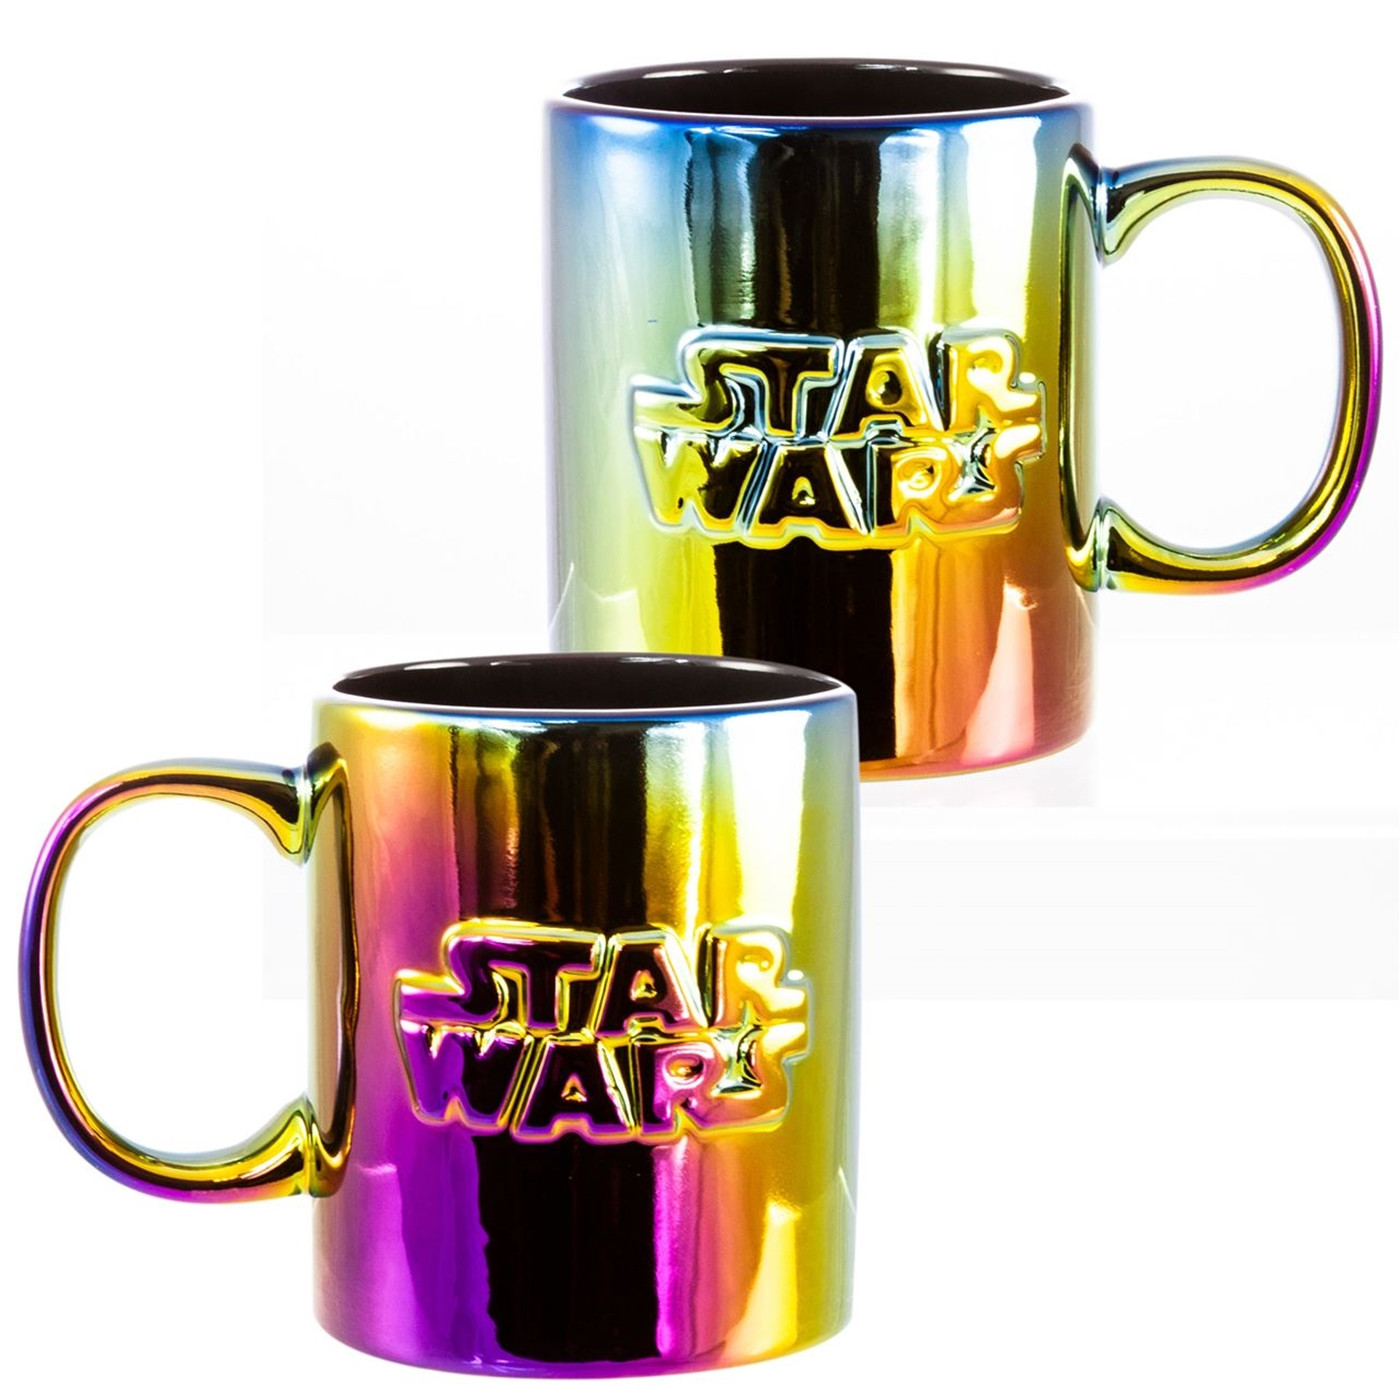 Star Wars Iridescent Logo 11oz Mug